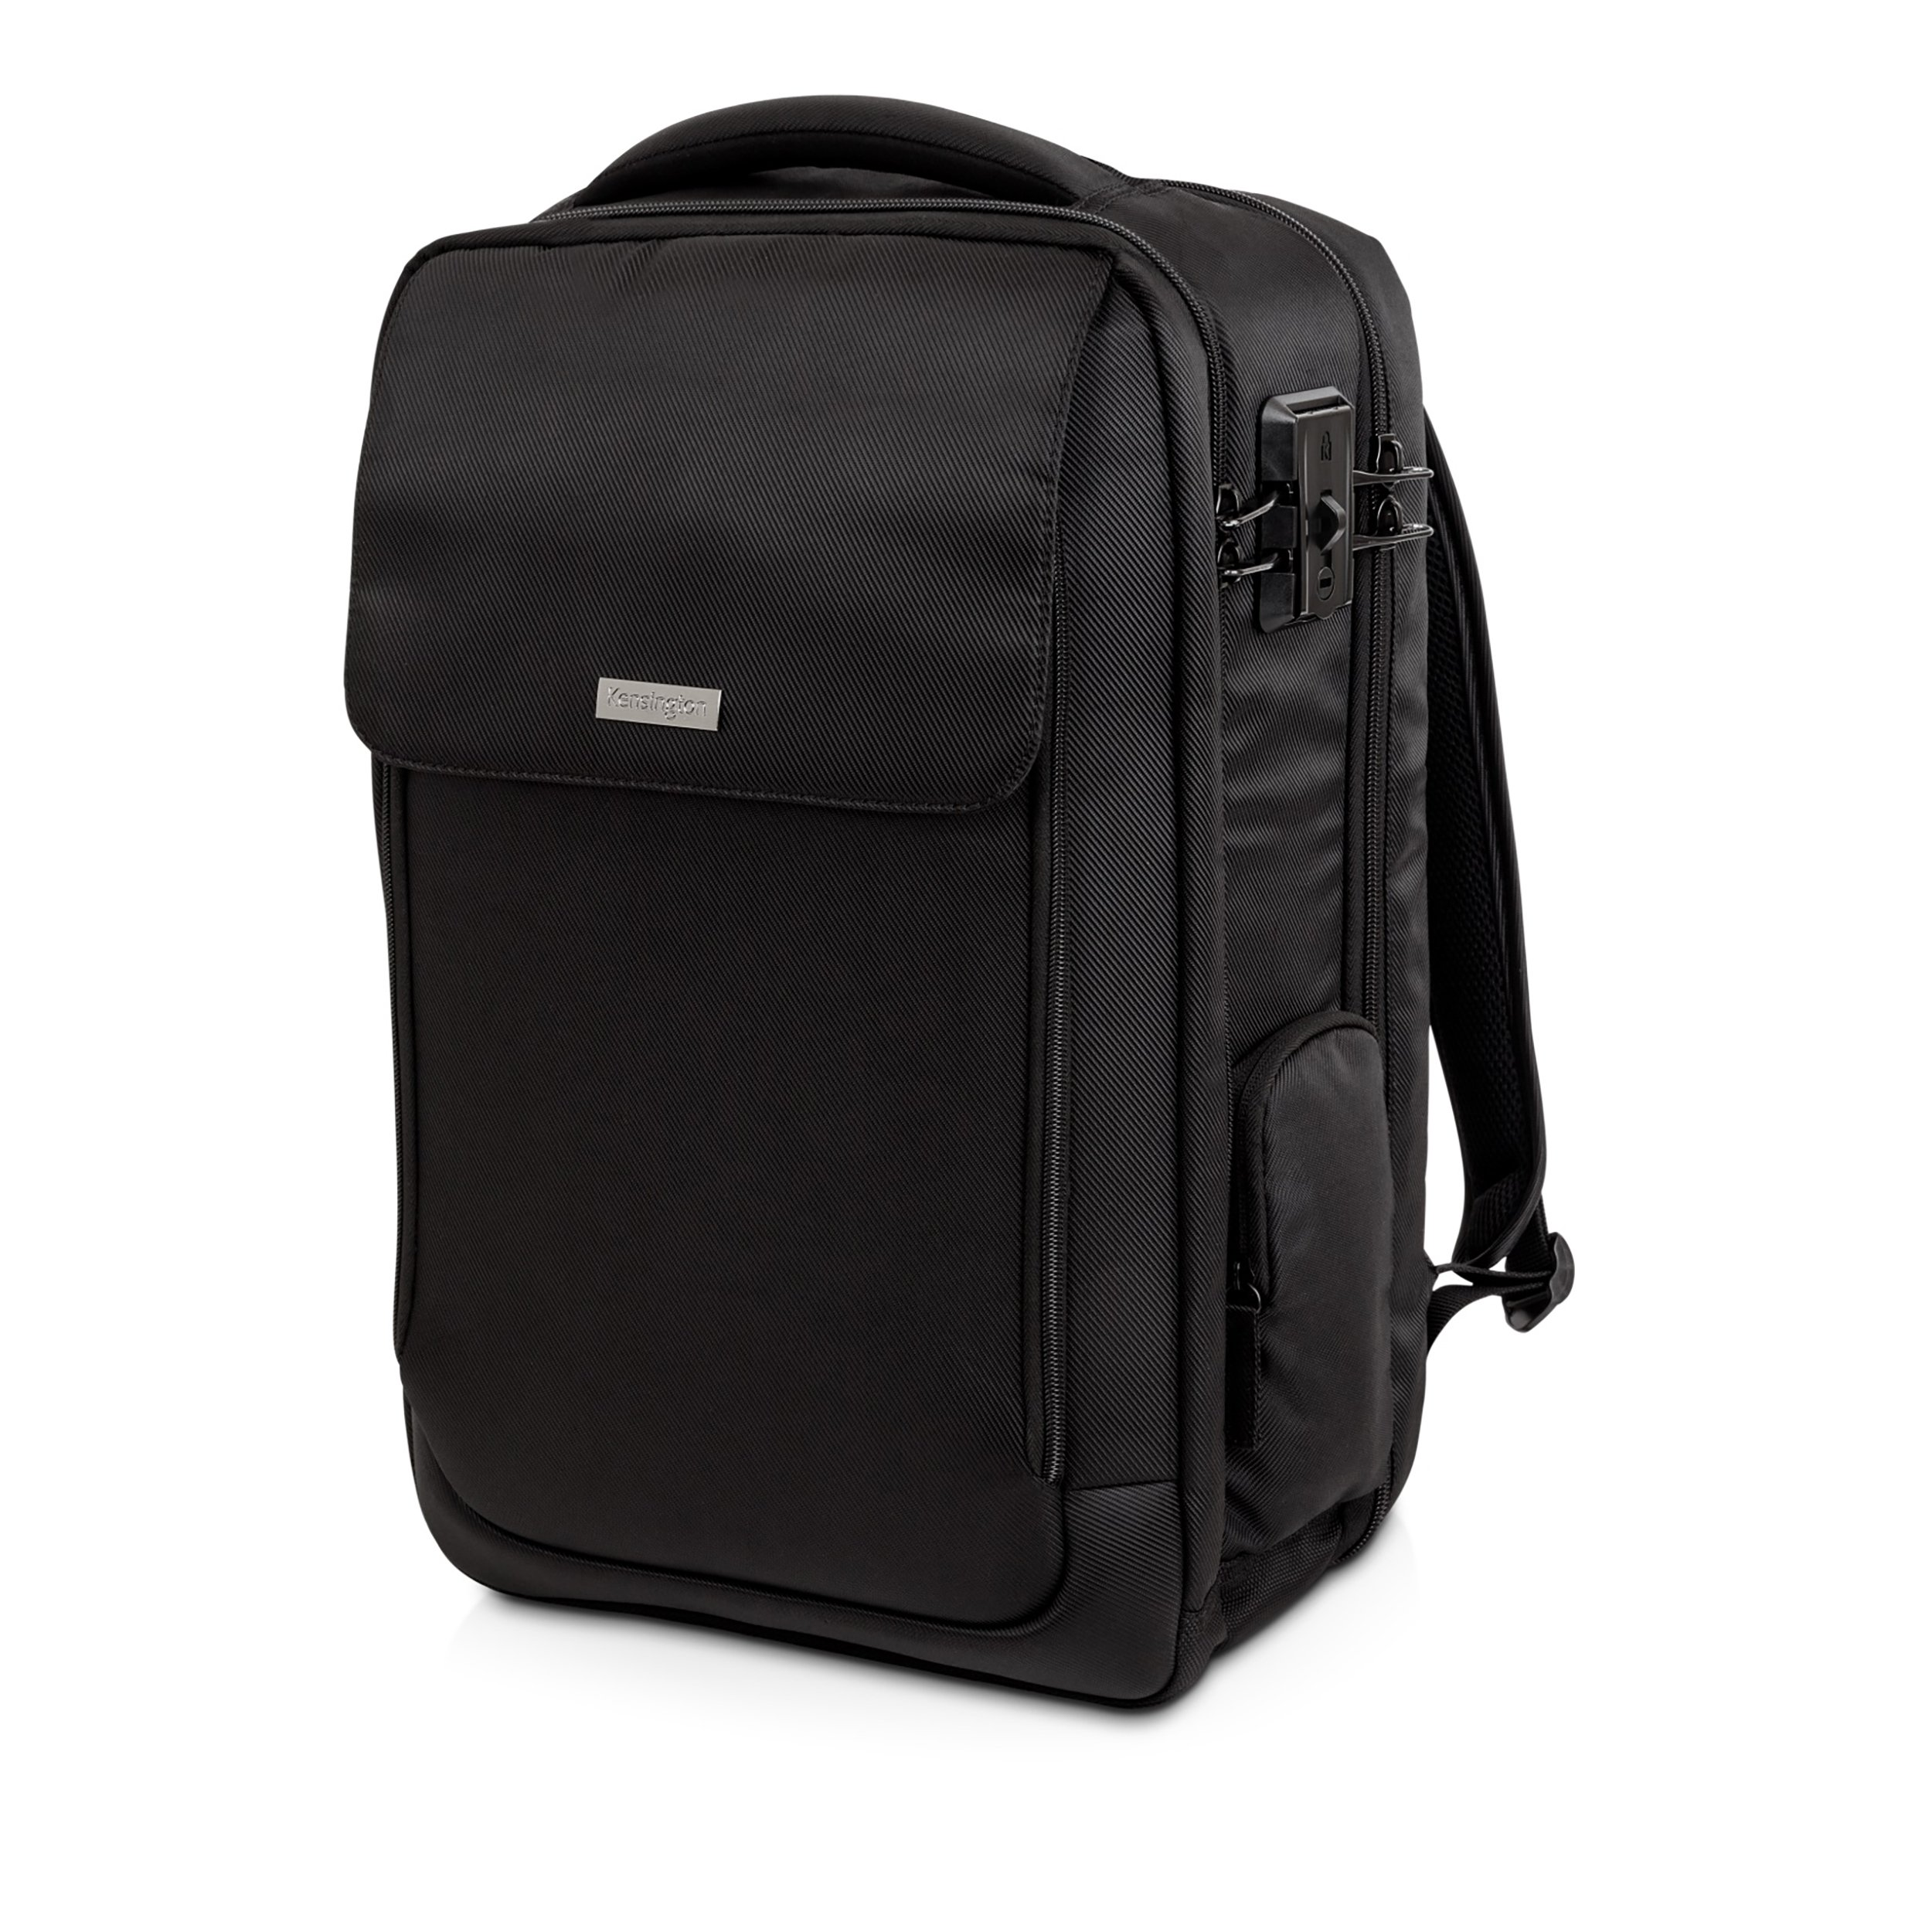 Kensington SecureTrek 17'' Lockable Anti-Theft Laptop & Overnight Backpack (K98618WW)